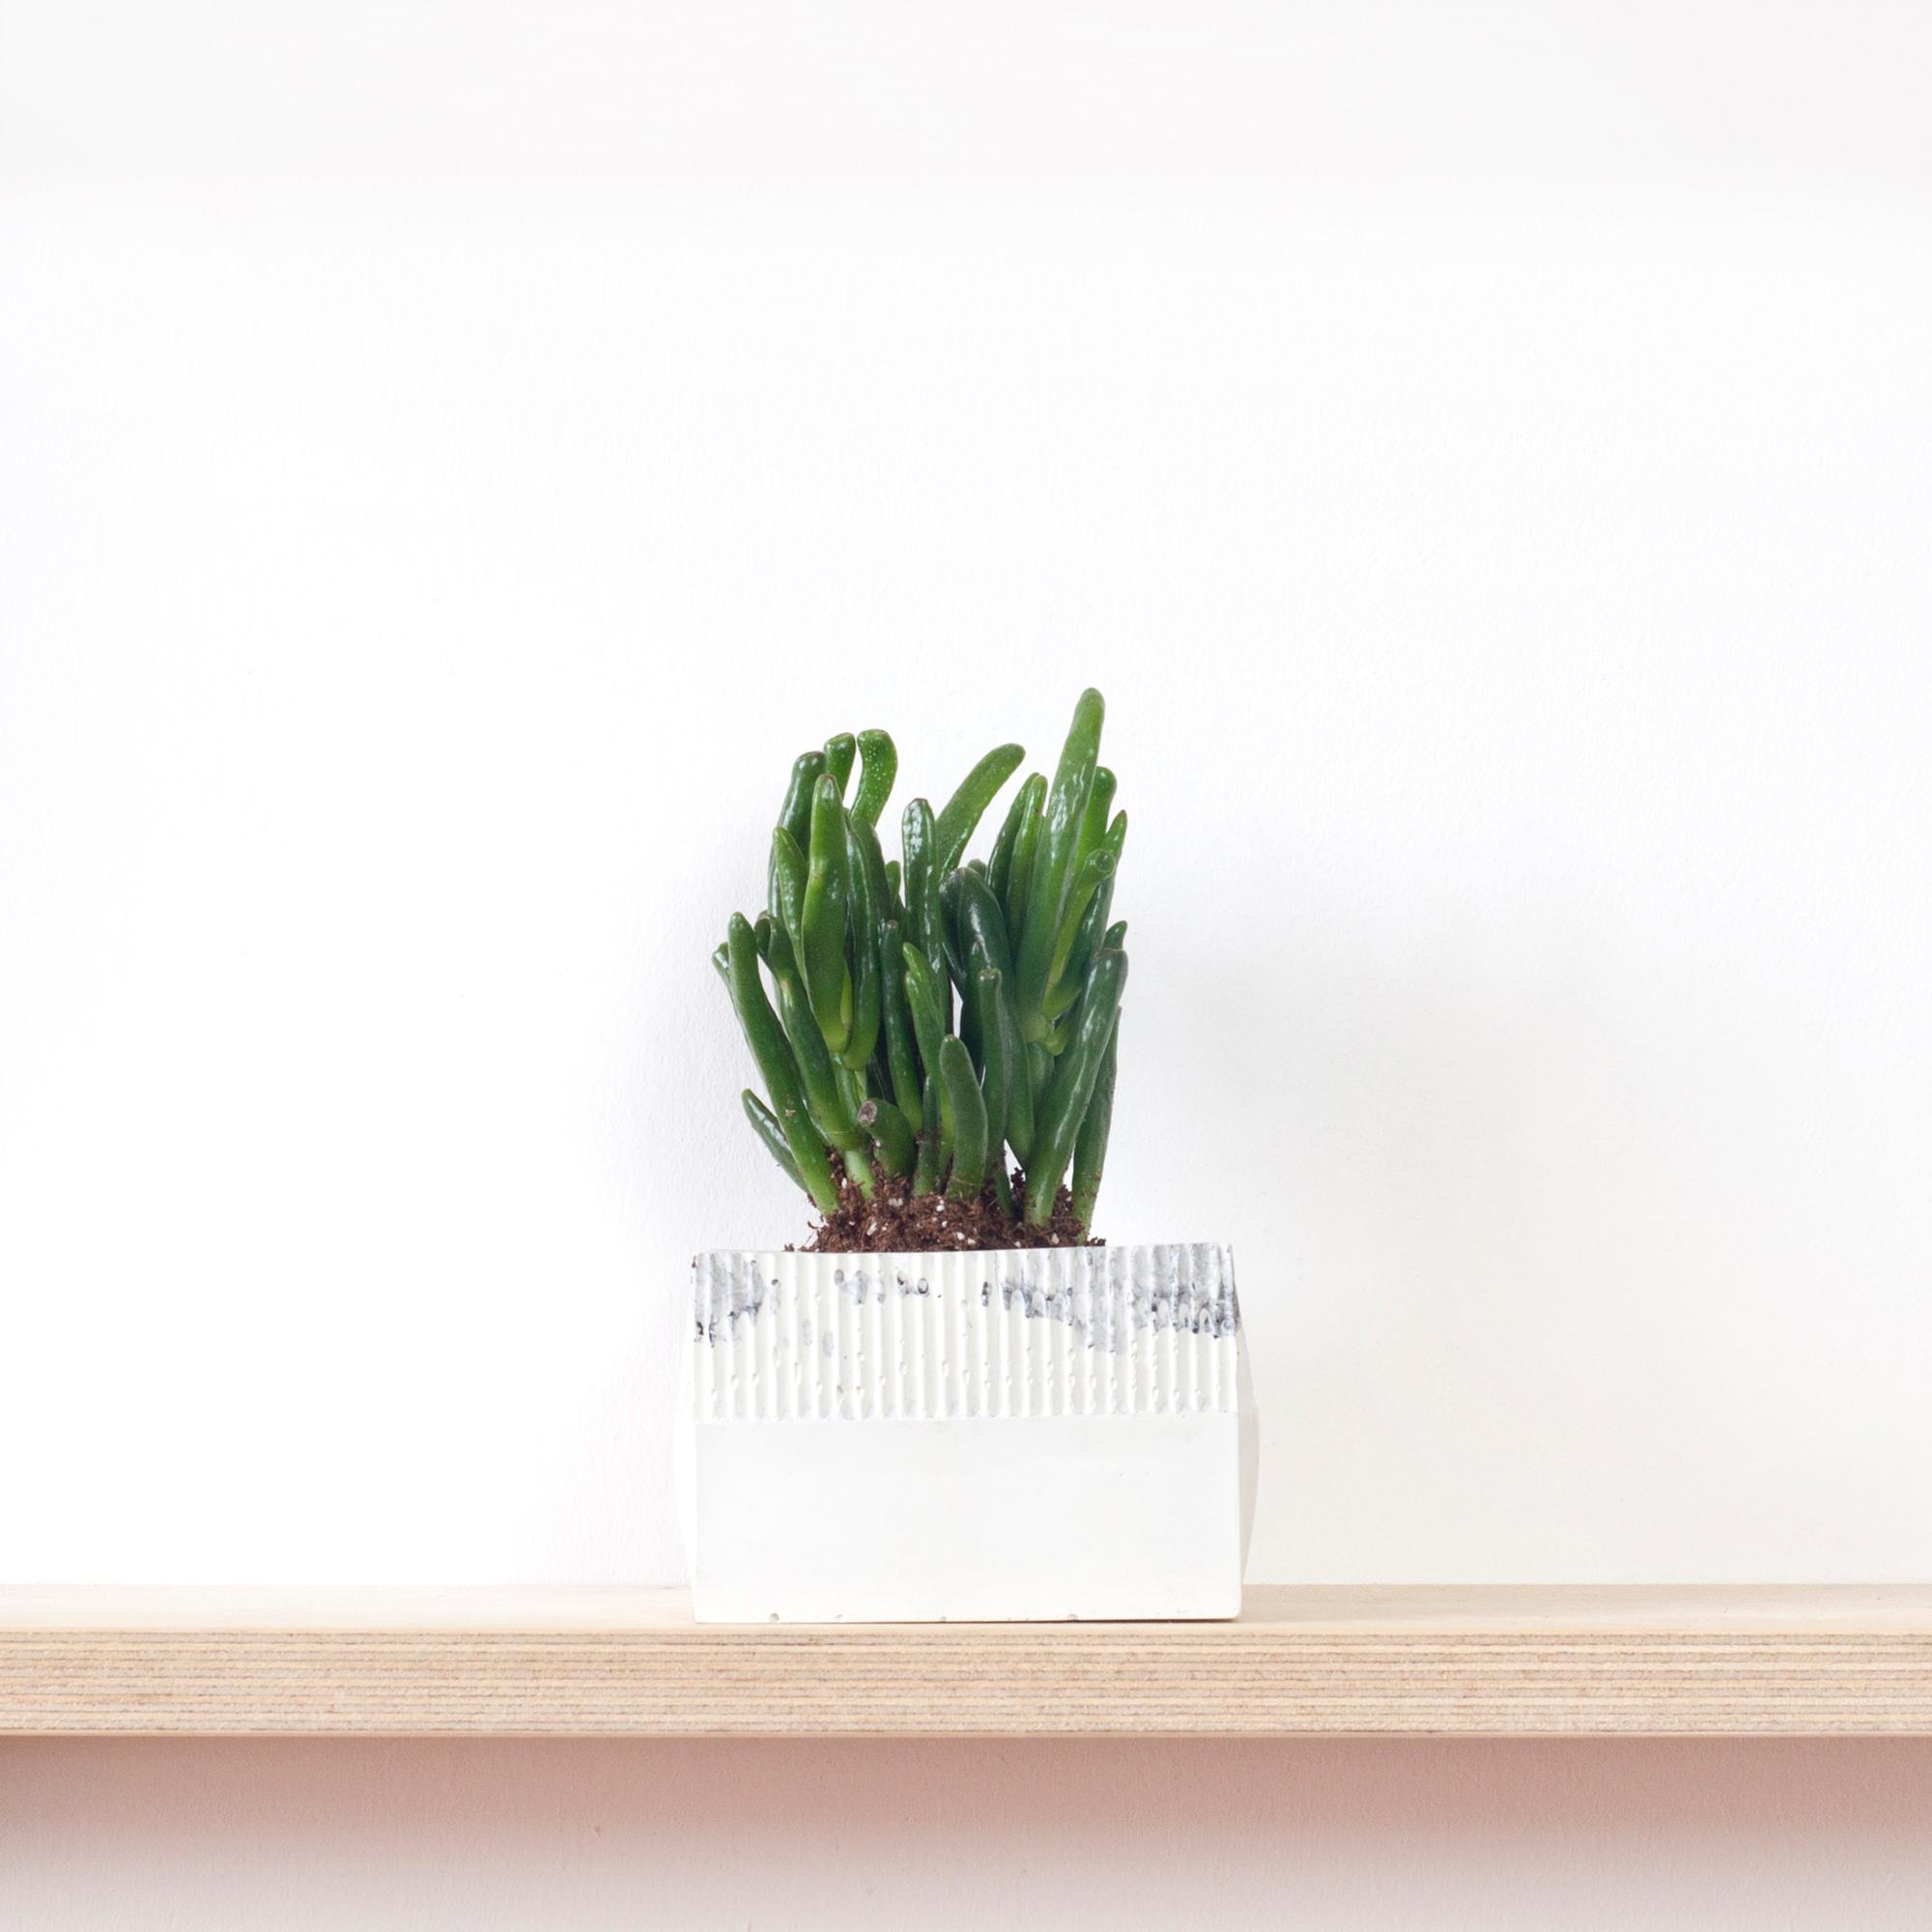 9-plantpot-onedesignspace-web.jpg